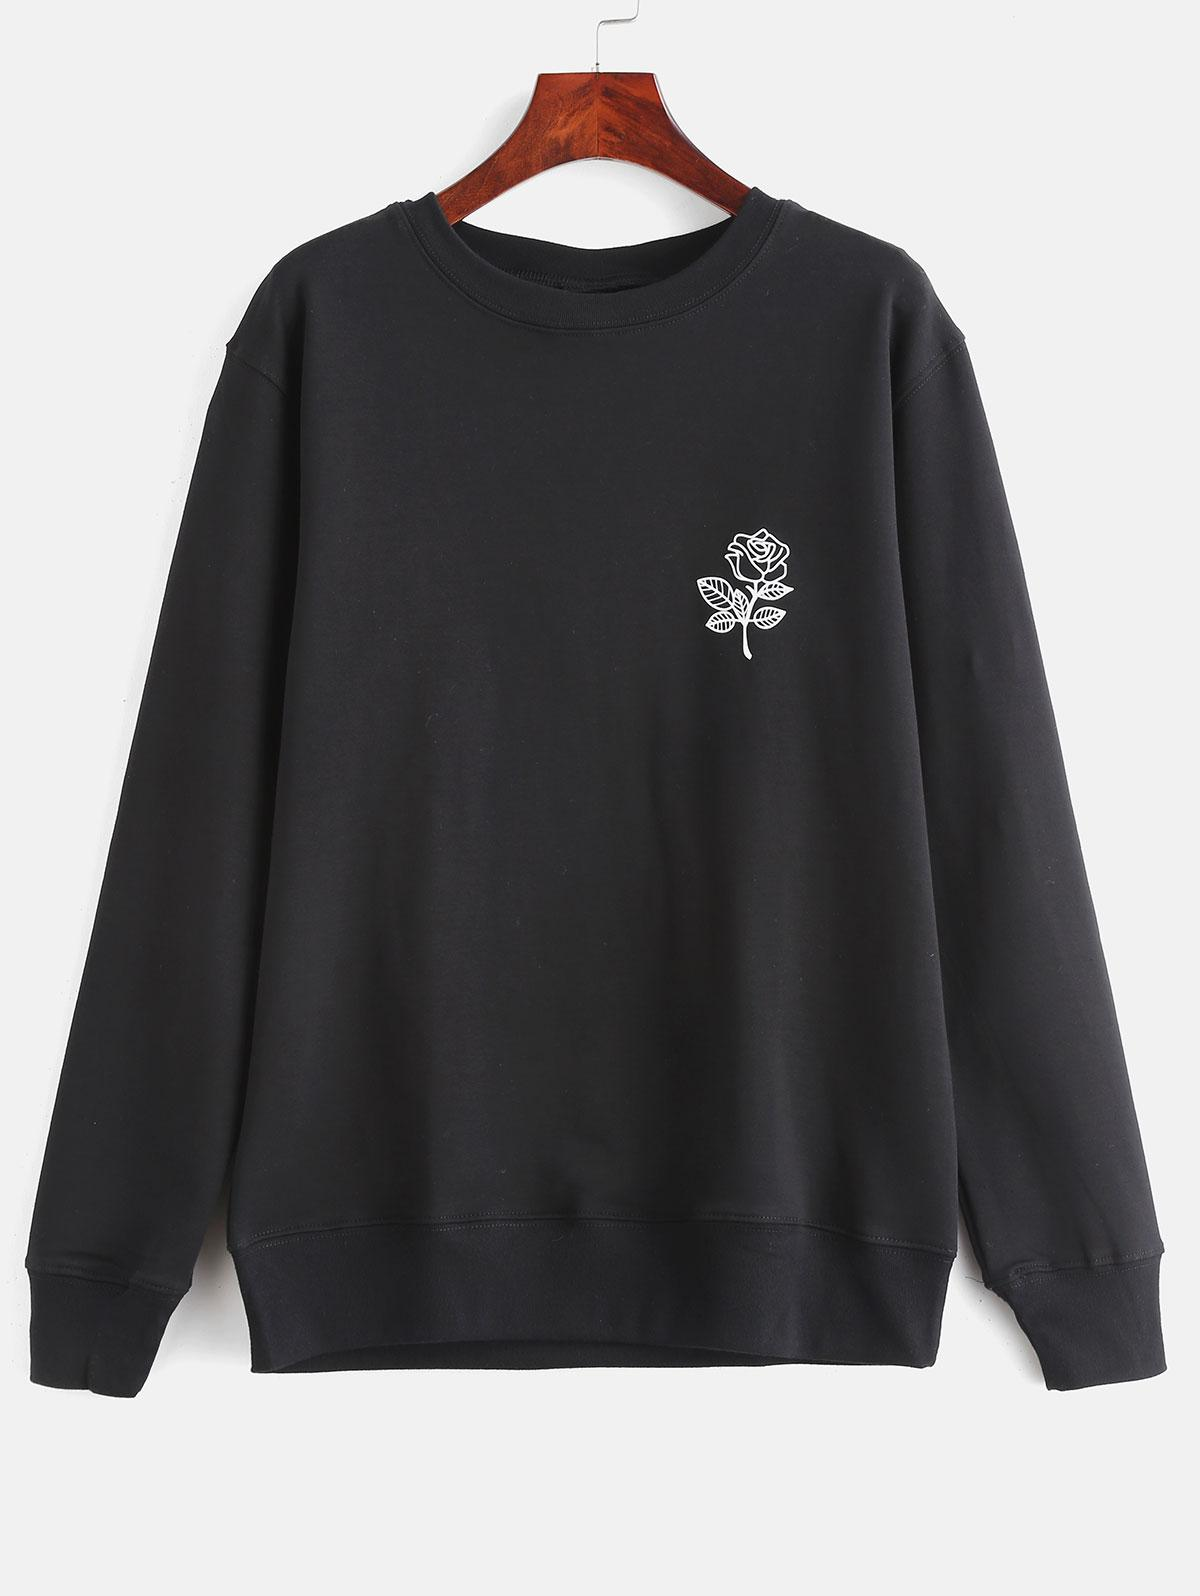 Floral Print Graphic Pullover Sweatshirt фото